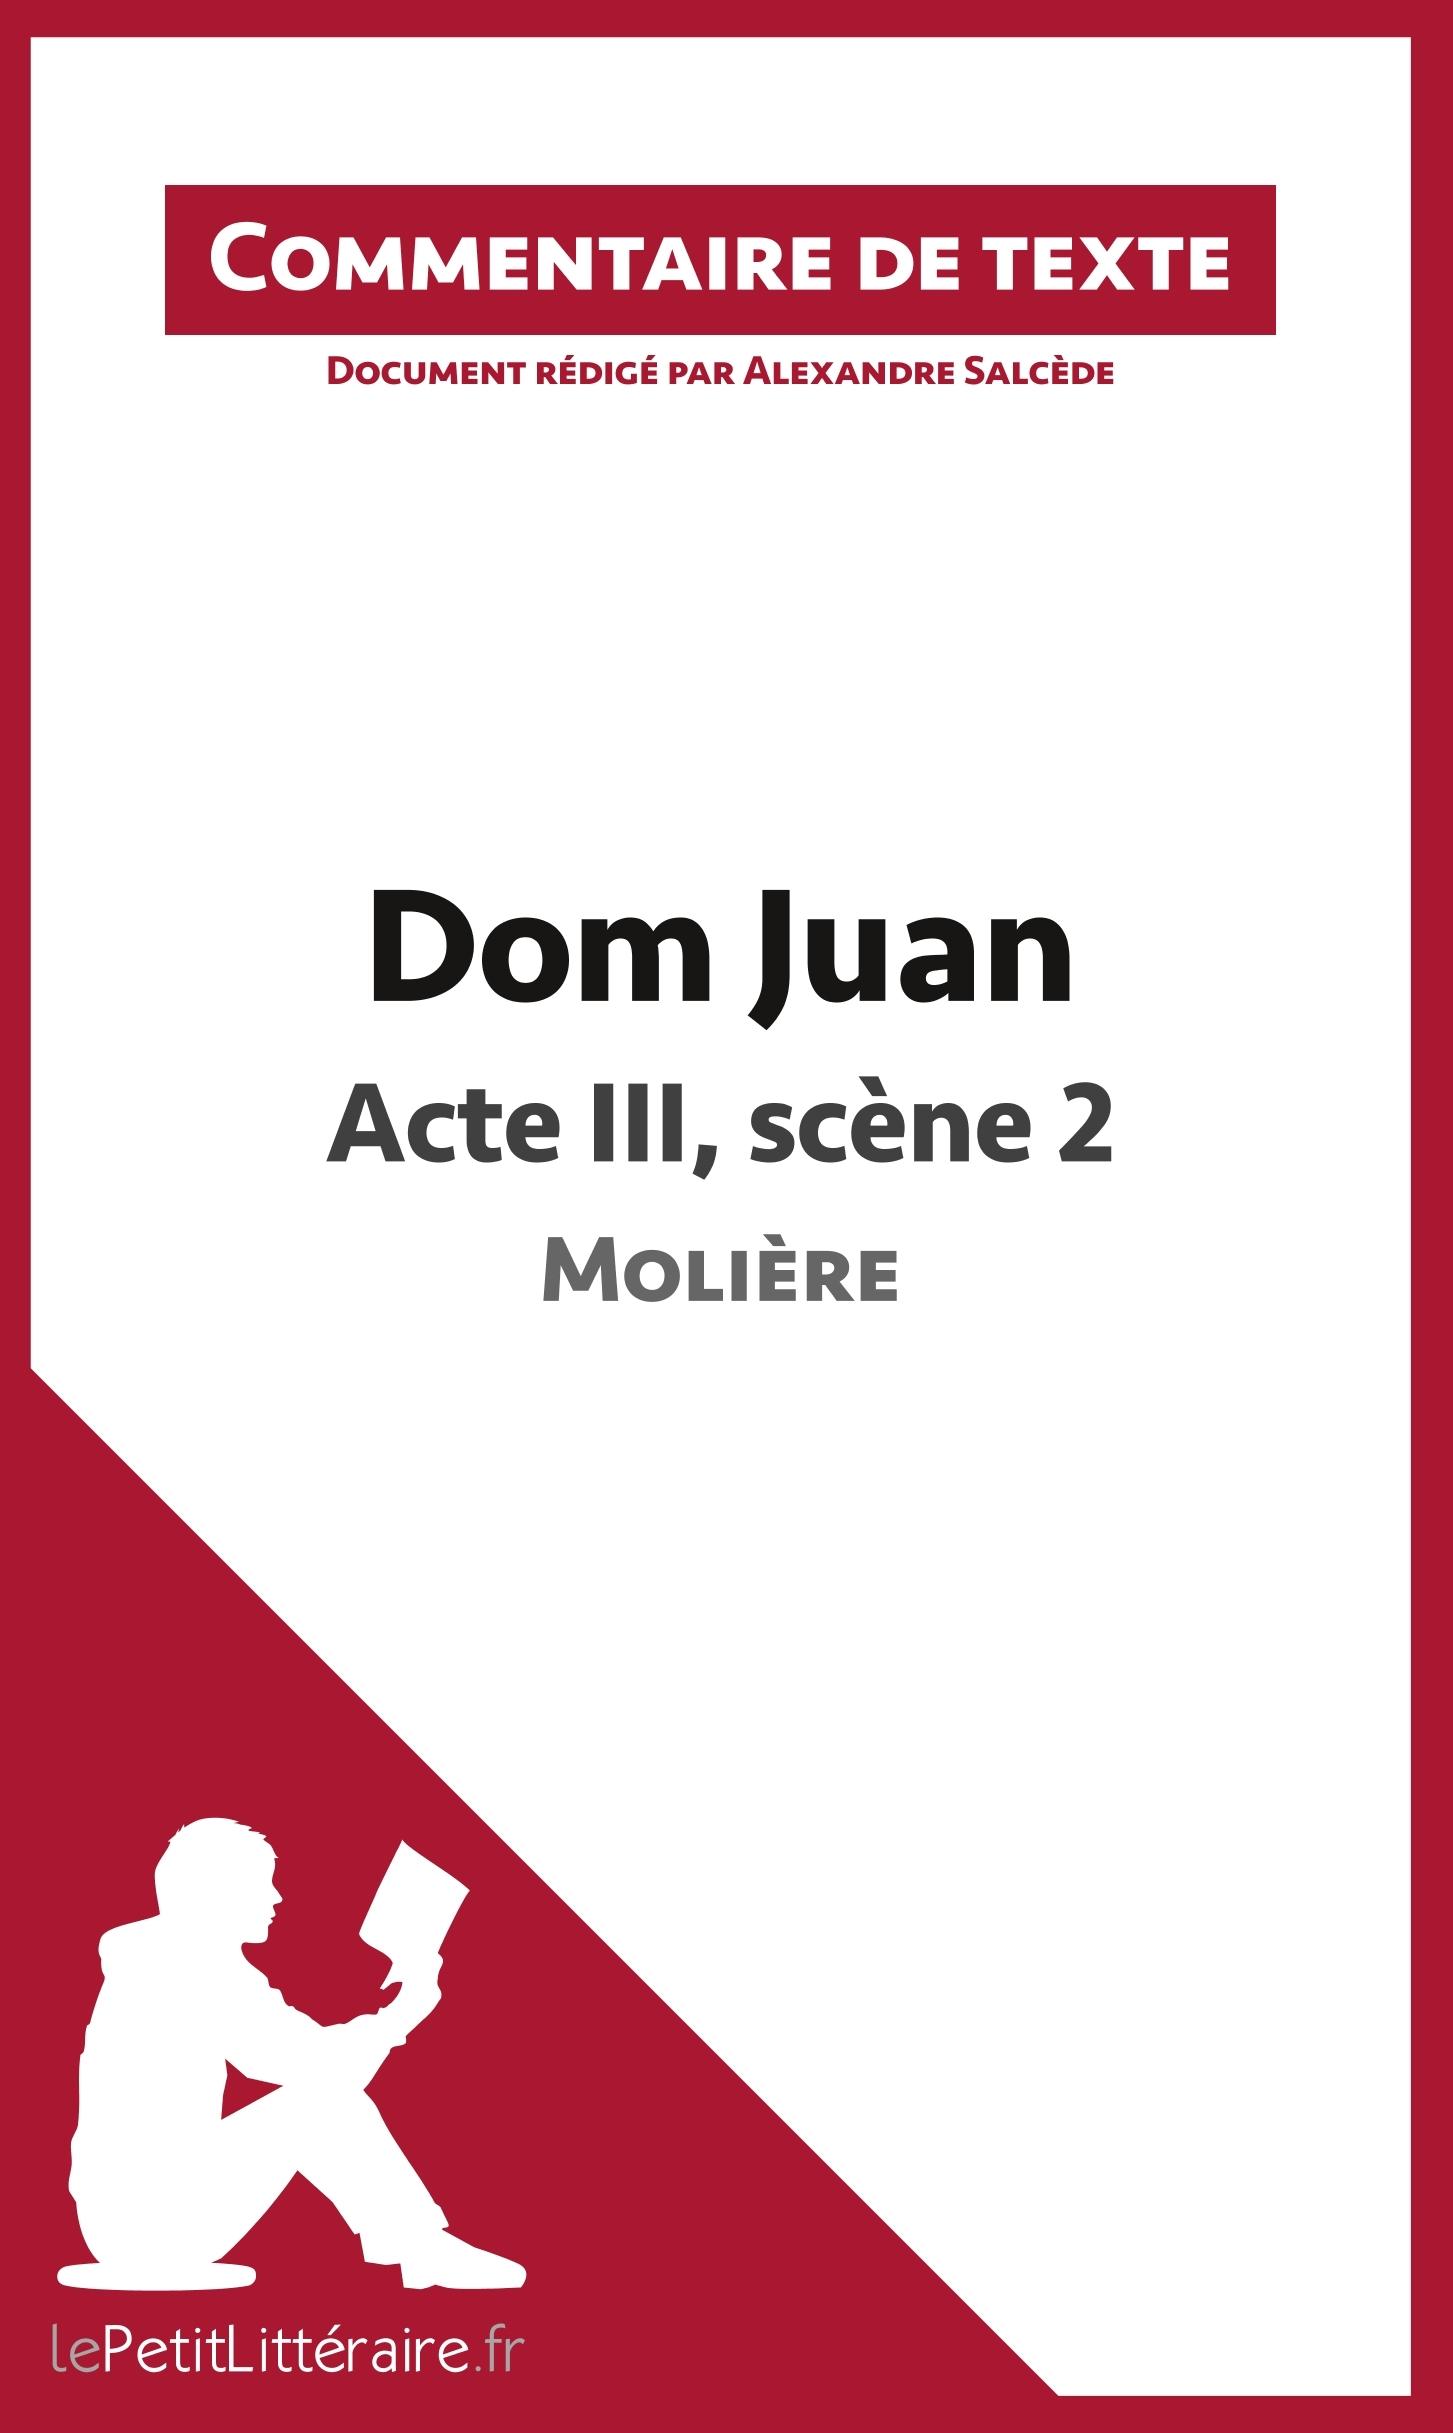 COMMENTAIRE COMPOSE DOM JUAN DE MOLIERE ACTE III SCENE 2